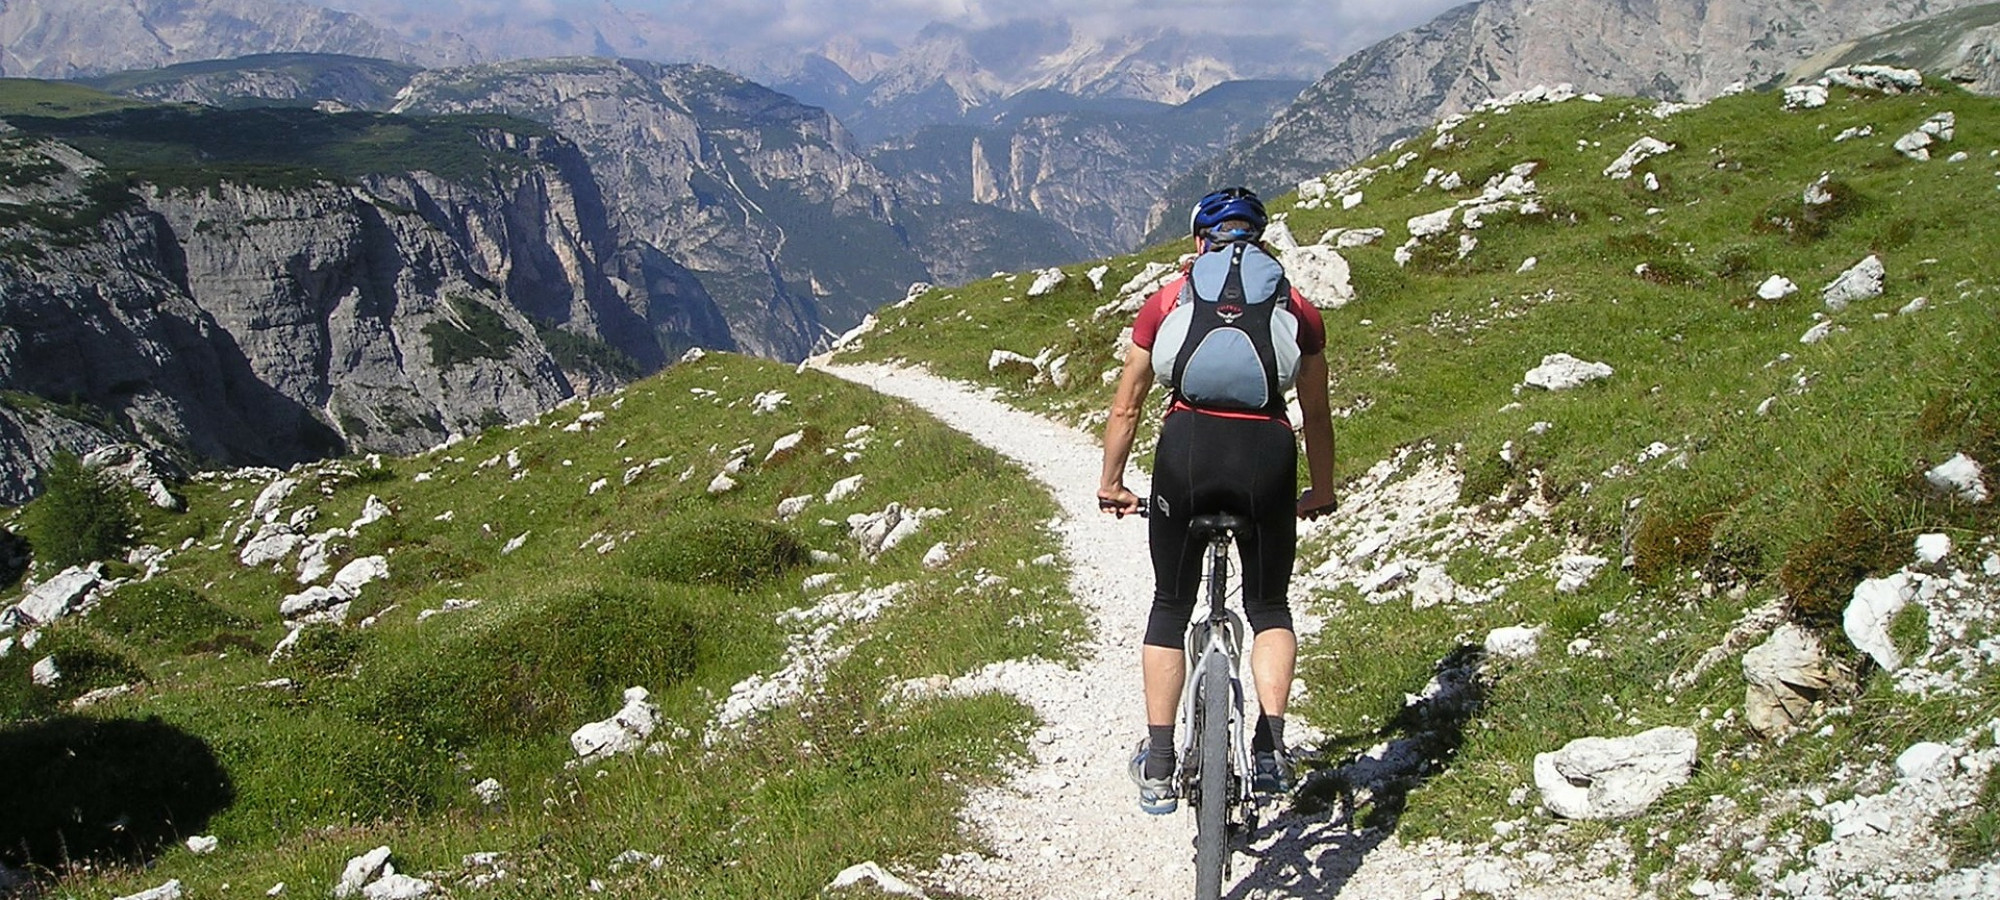 Mountain biking Ben Nevis